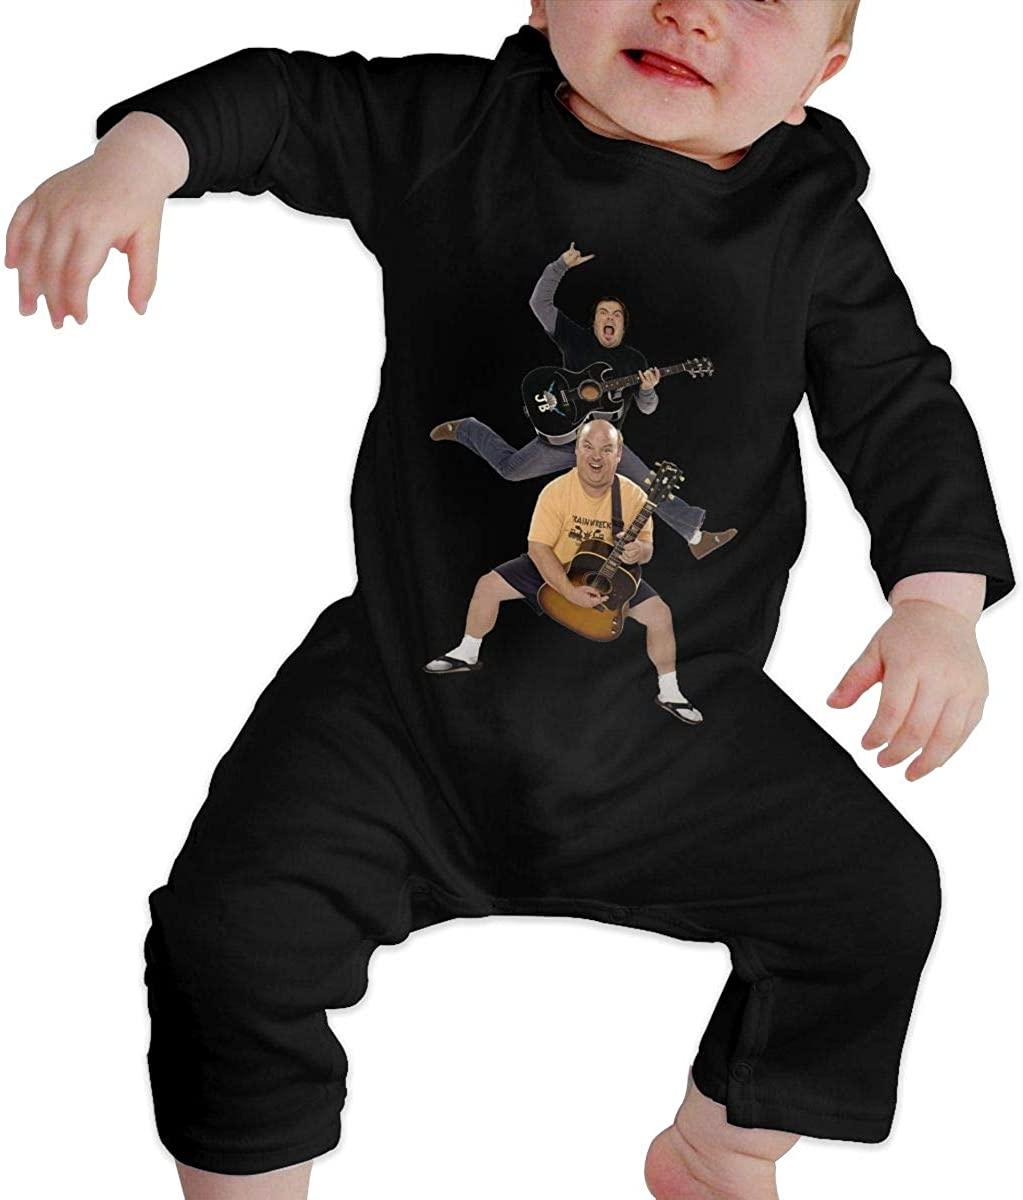 Qq1-asd-store Tenacious D Boys/Girls Baby Cotton Long Sleeve Romper Warm Bodysuit